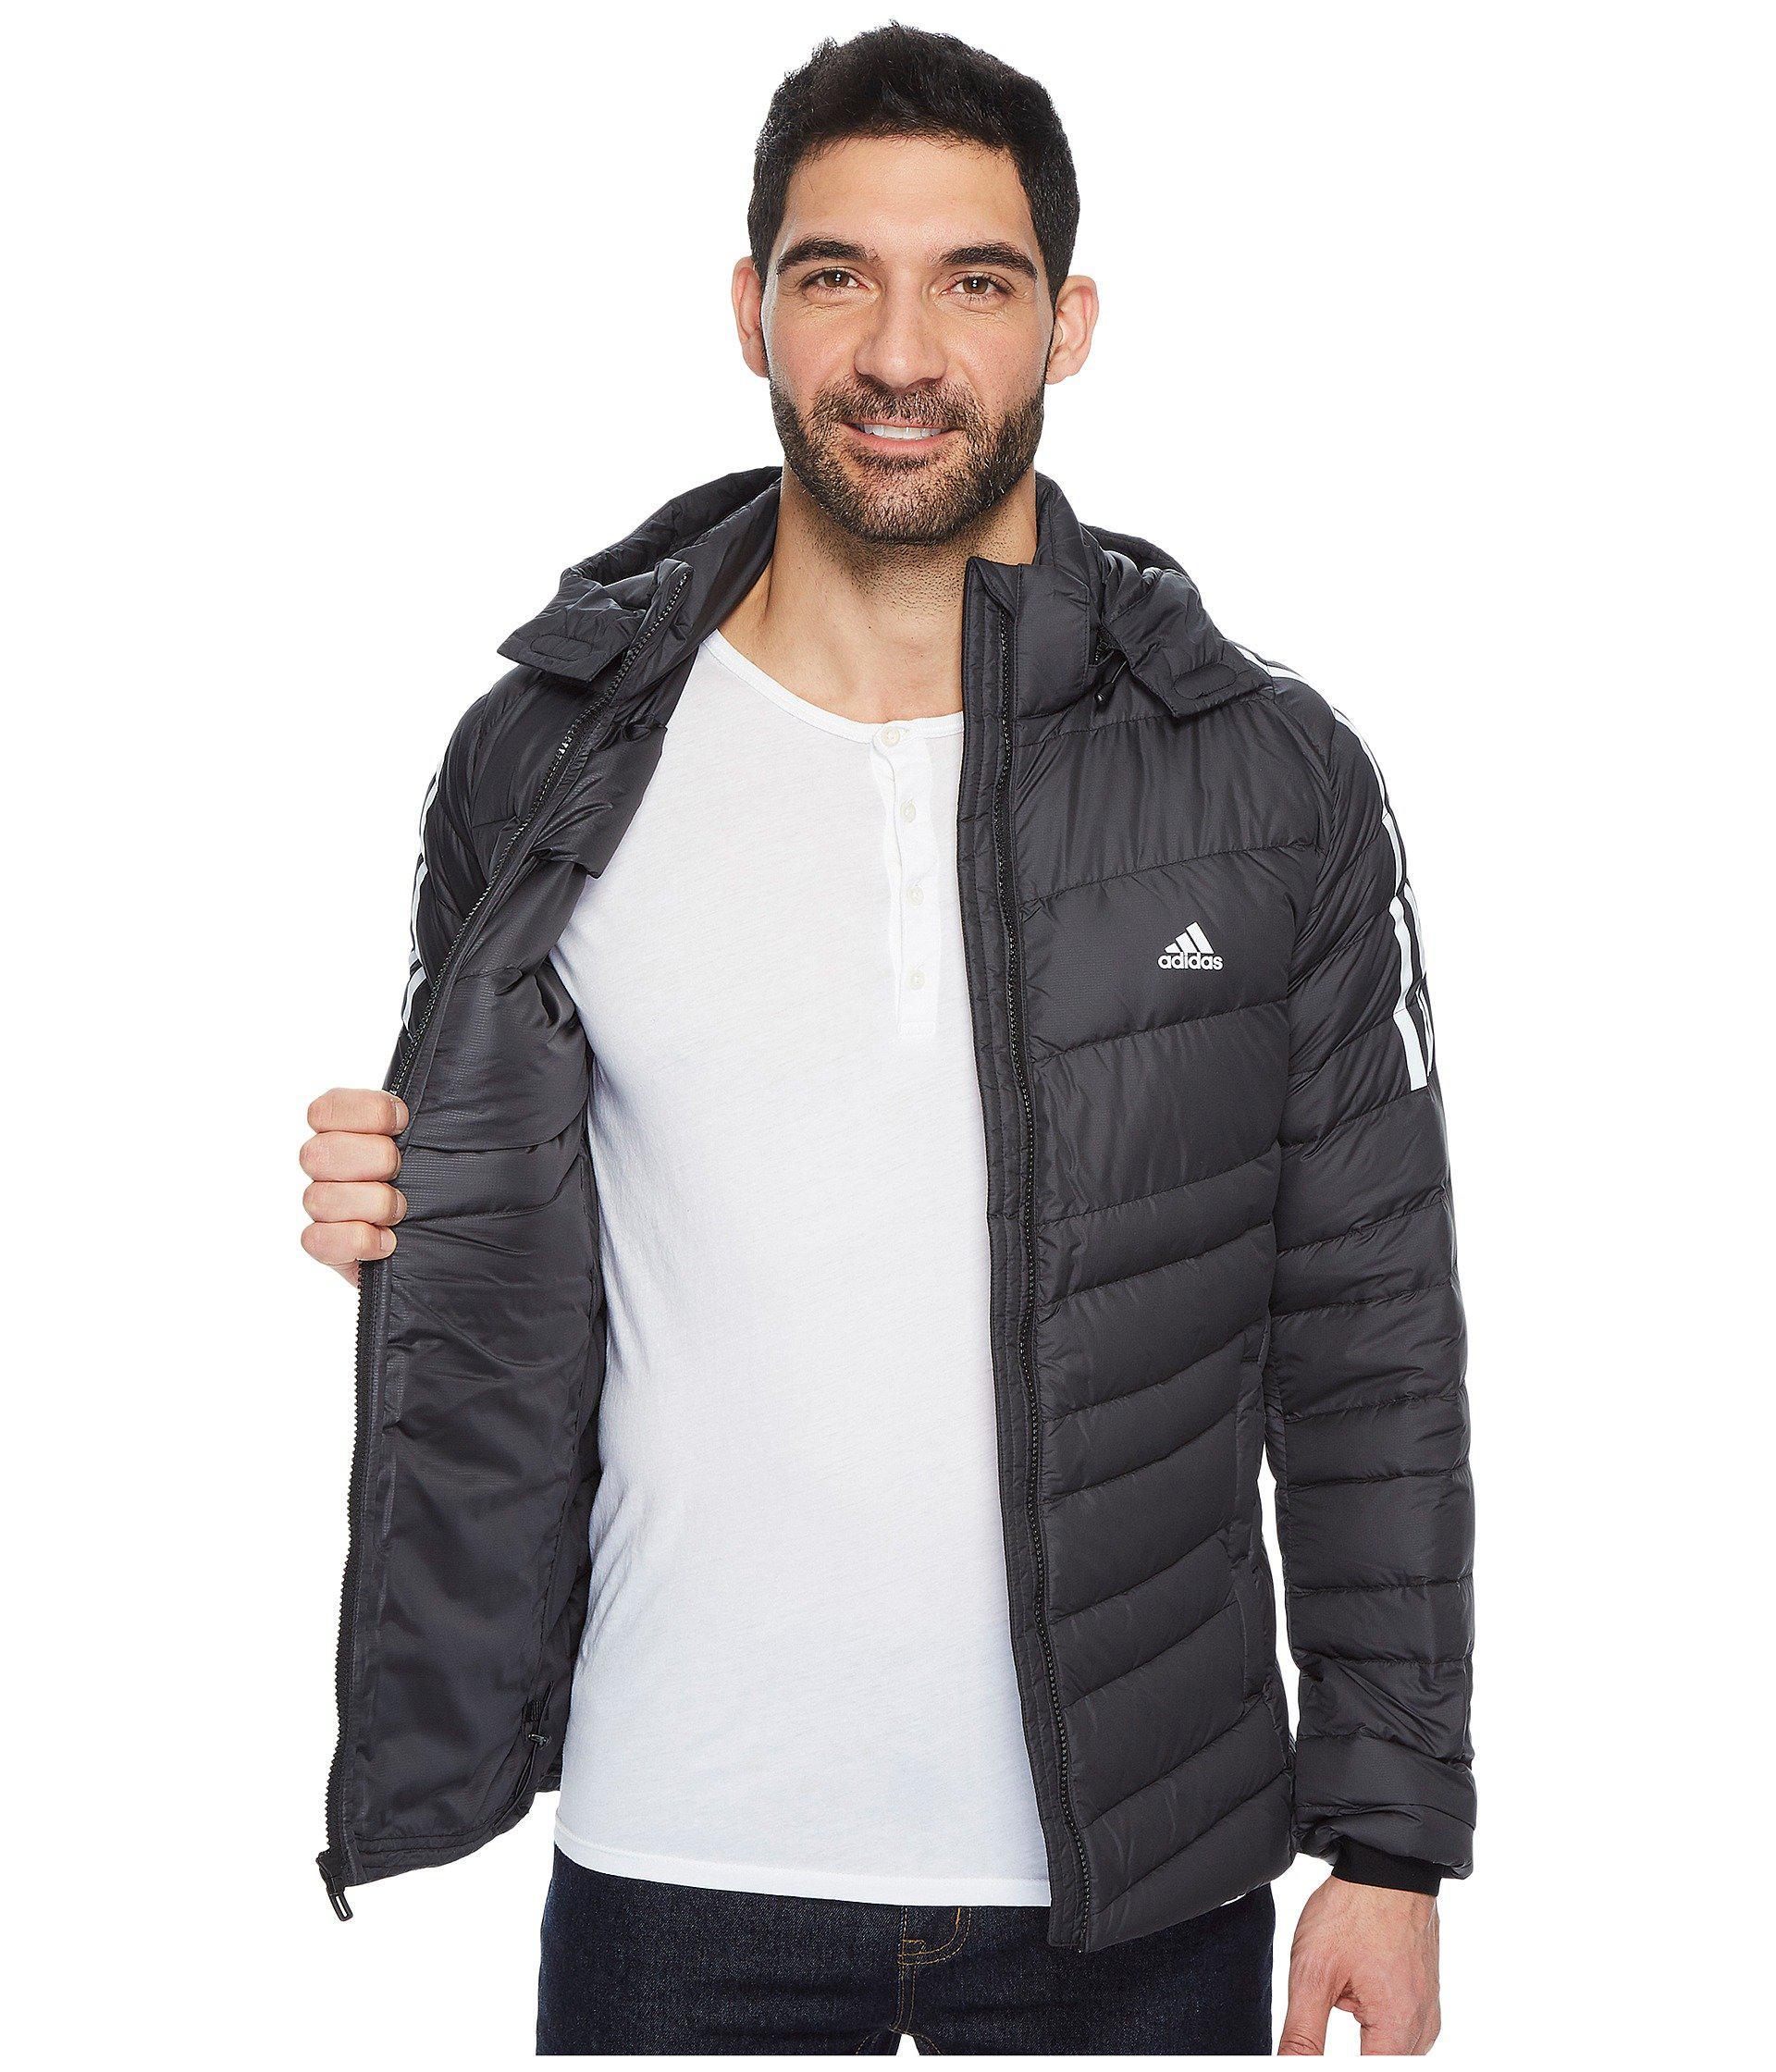 Lyst adidas Originals ClimaWarm ® itavic 3 Stripe Jacket in Black